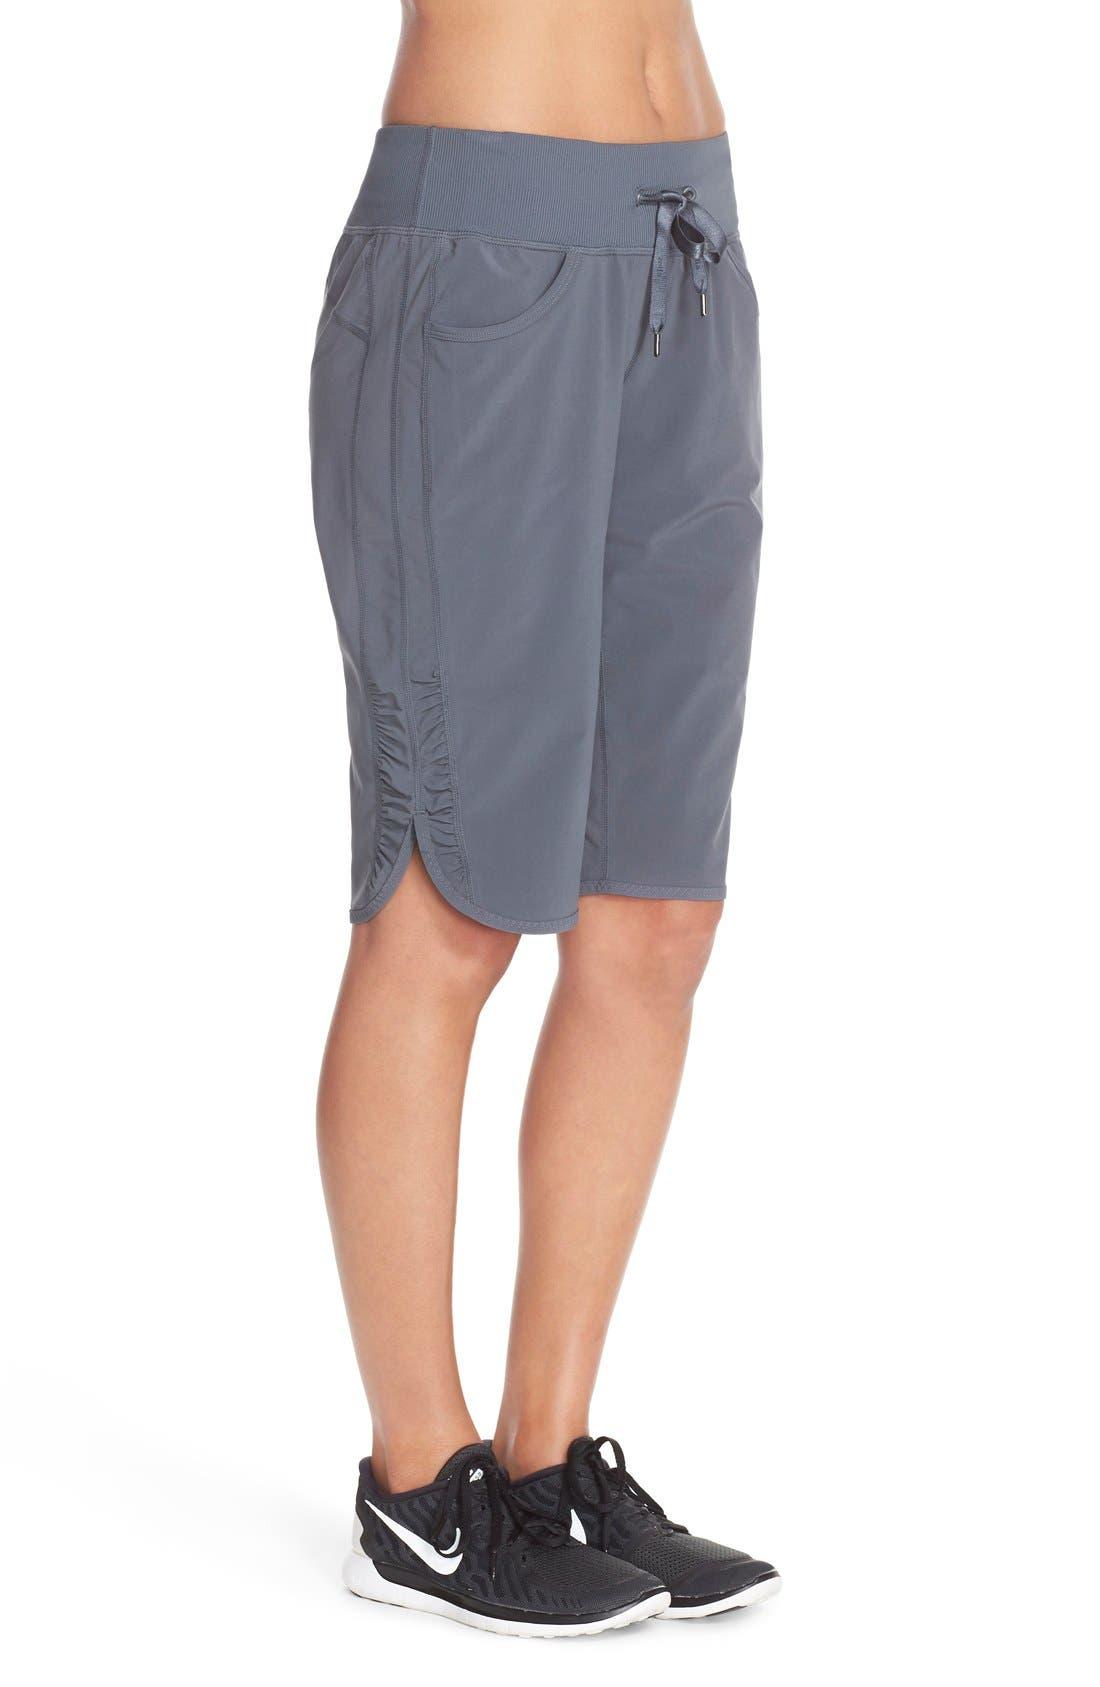 Alternate Image 3  - Zella 'City' Shorts (Online Only)